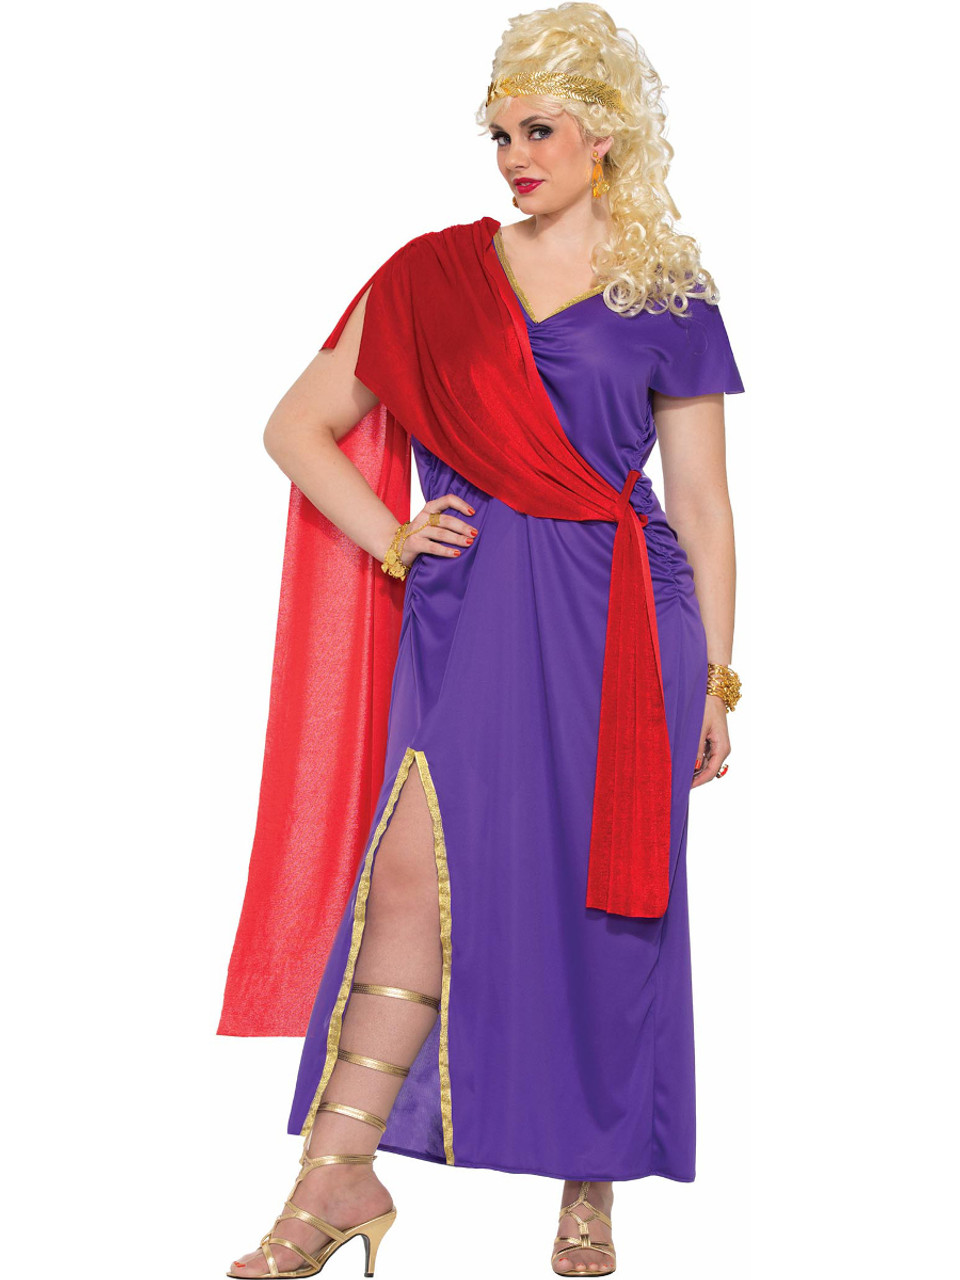 2bdc0e8440d Adult's Womens Roman Woman Goddess Dress Costume X-Large 18-22